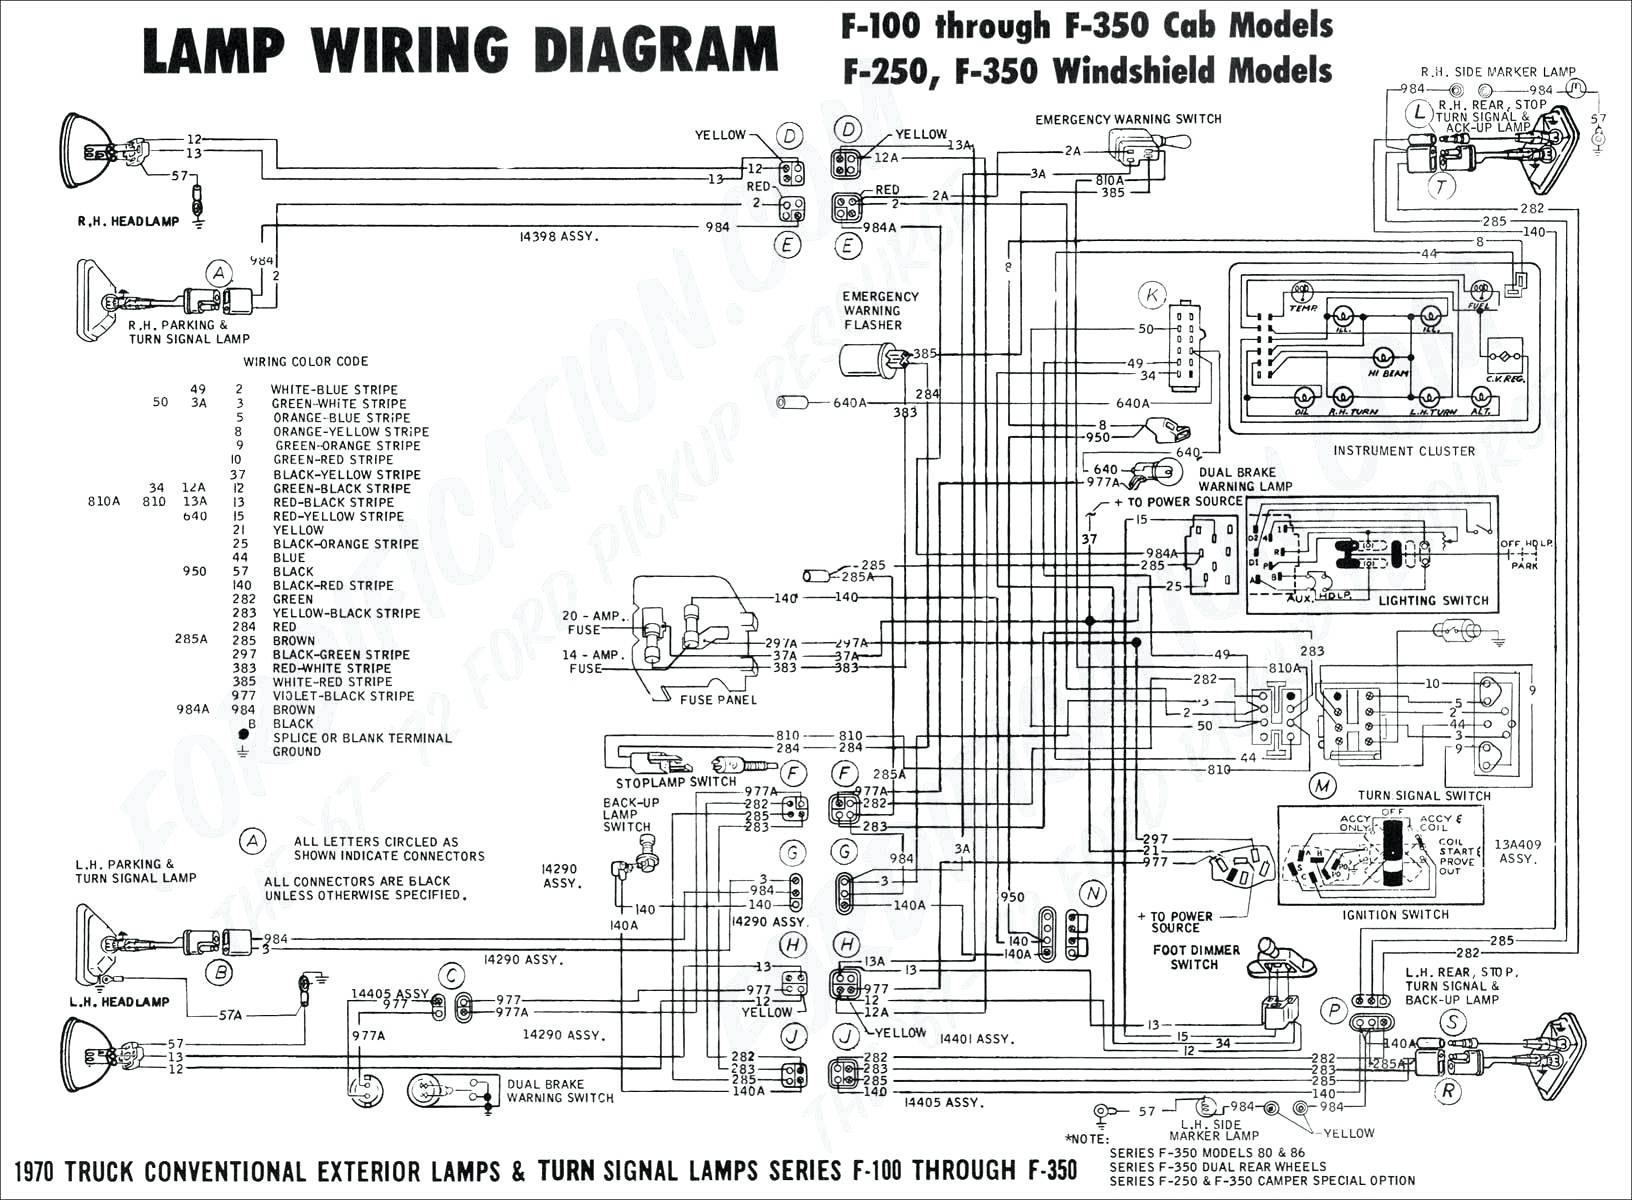 1993 toyota corolla alternator wiring diagram fender hot rod deluxe harness 2000